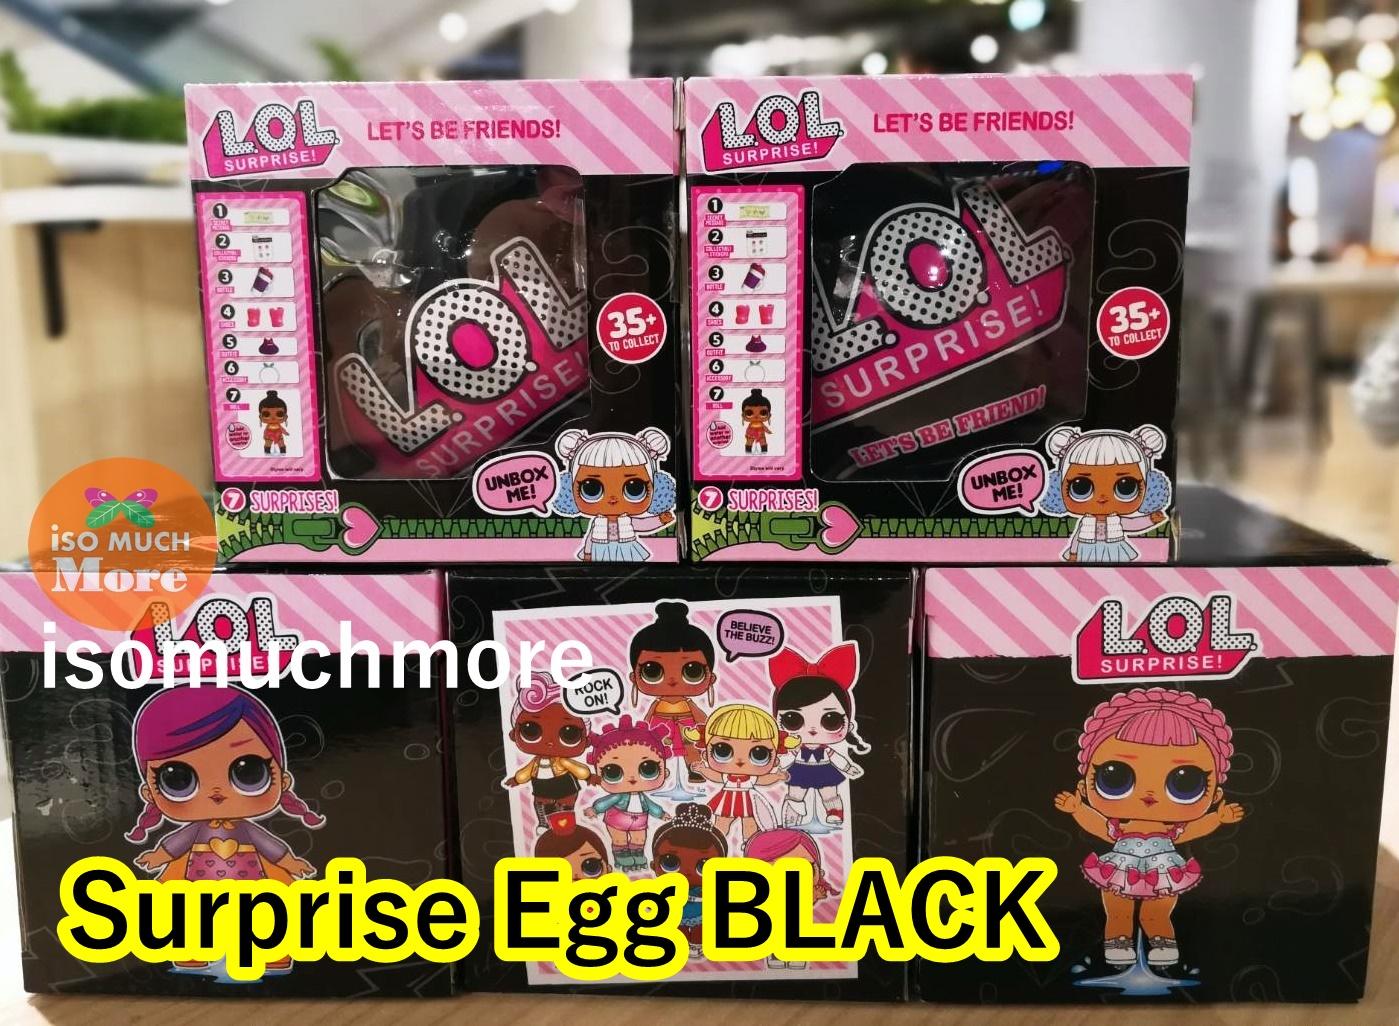 New! ไข่เซอร์ไพร์ส ไข่สุ่ม ไข่LOL ตุ๊กตาของเล่น ไข่สุ่มเซอร์ไพรส์ LOL Surprise Egg Black ลูกสีดำ แพ็คดี่ยว